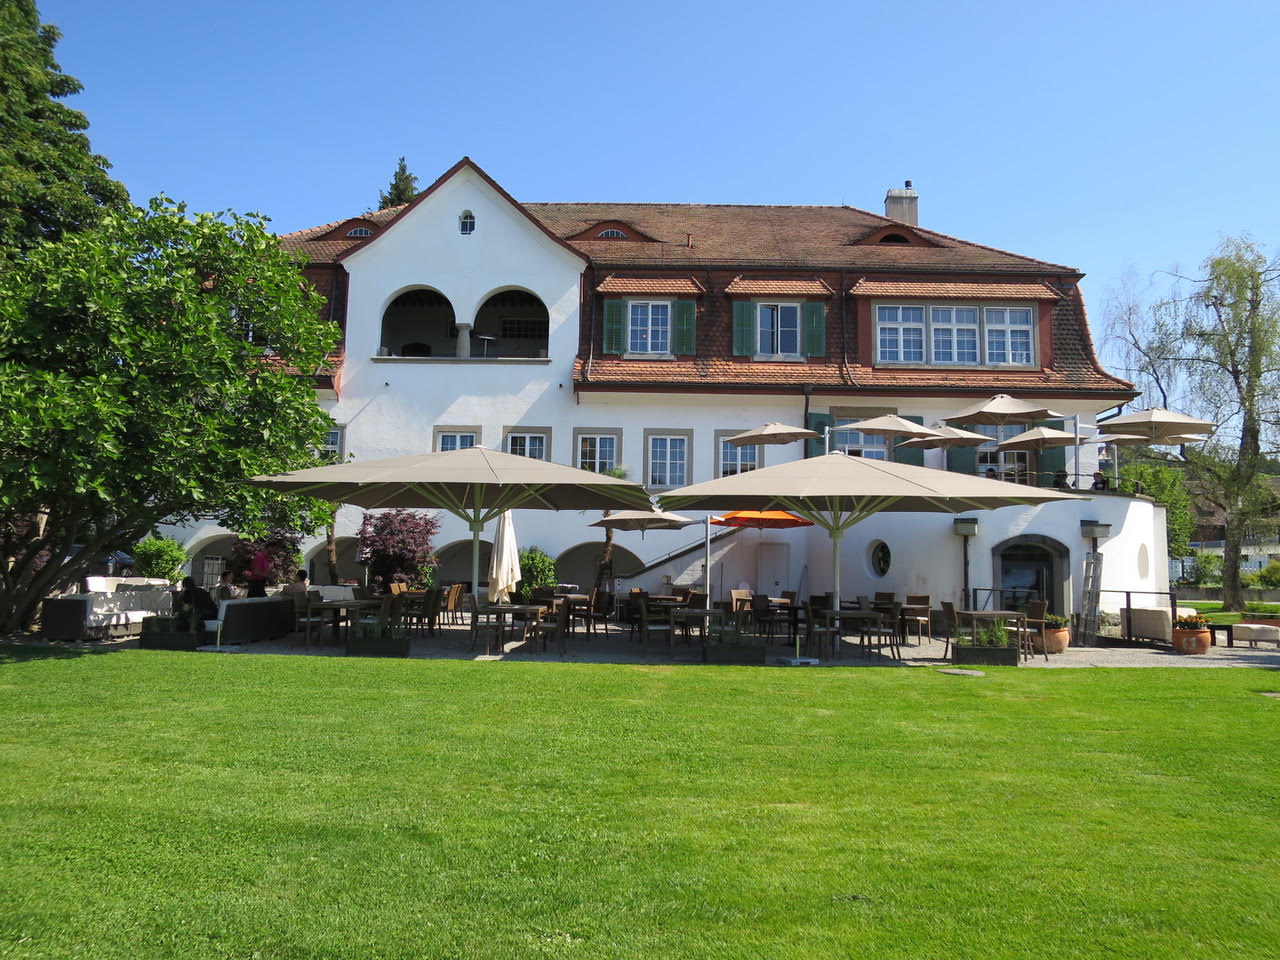 "MAY Sonnenschirme beim Event-Restaurant ""Villa Sunneschy"" im 2015 mit 2 May-Gross-Schirmen Modell Albatros 6x6m."